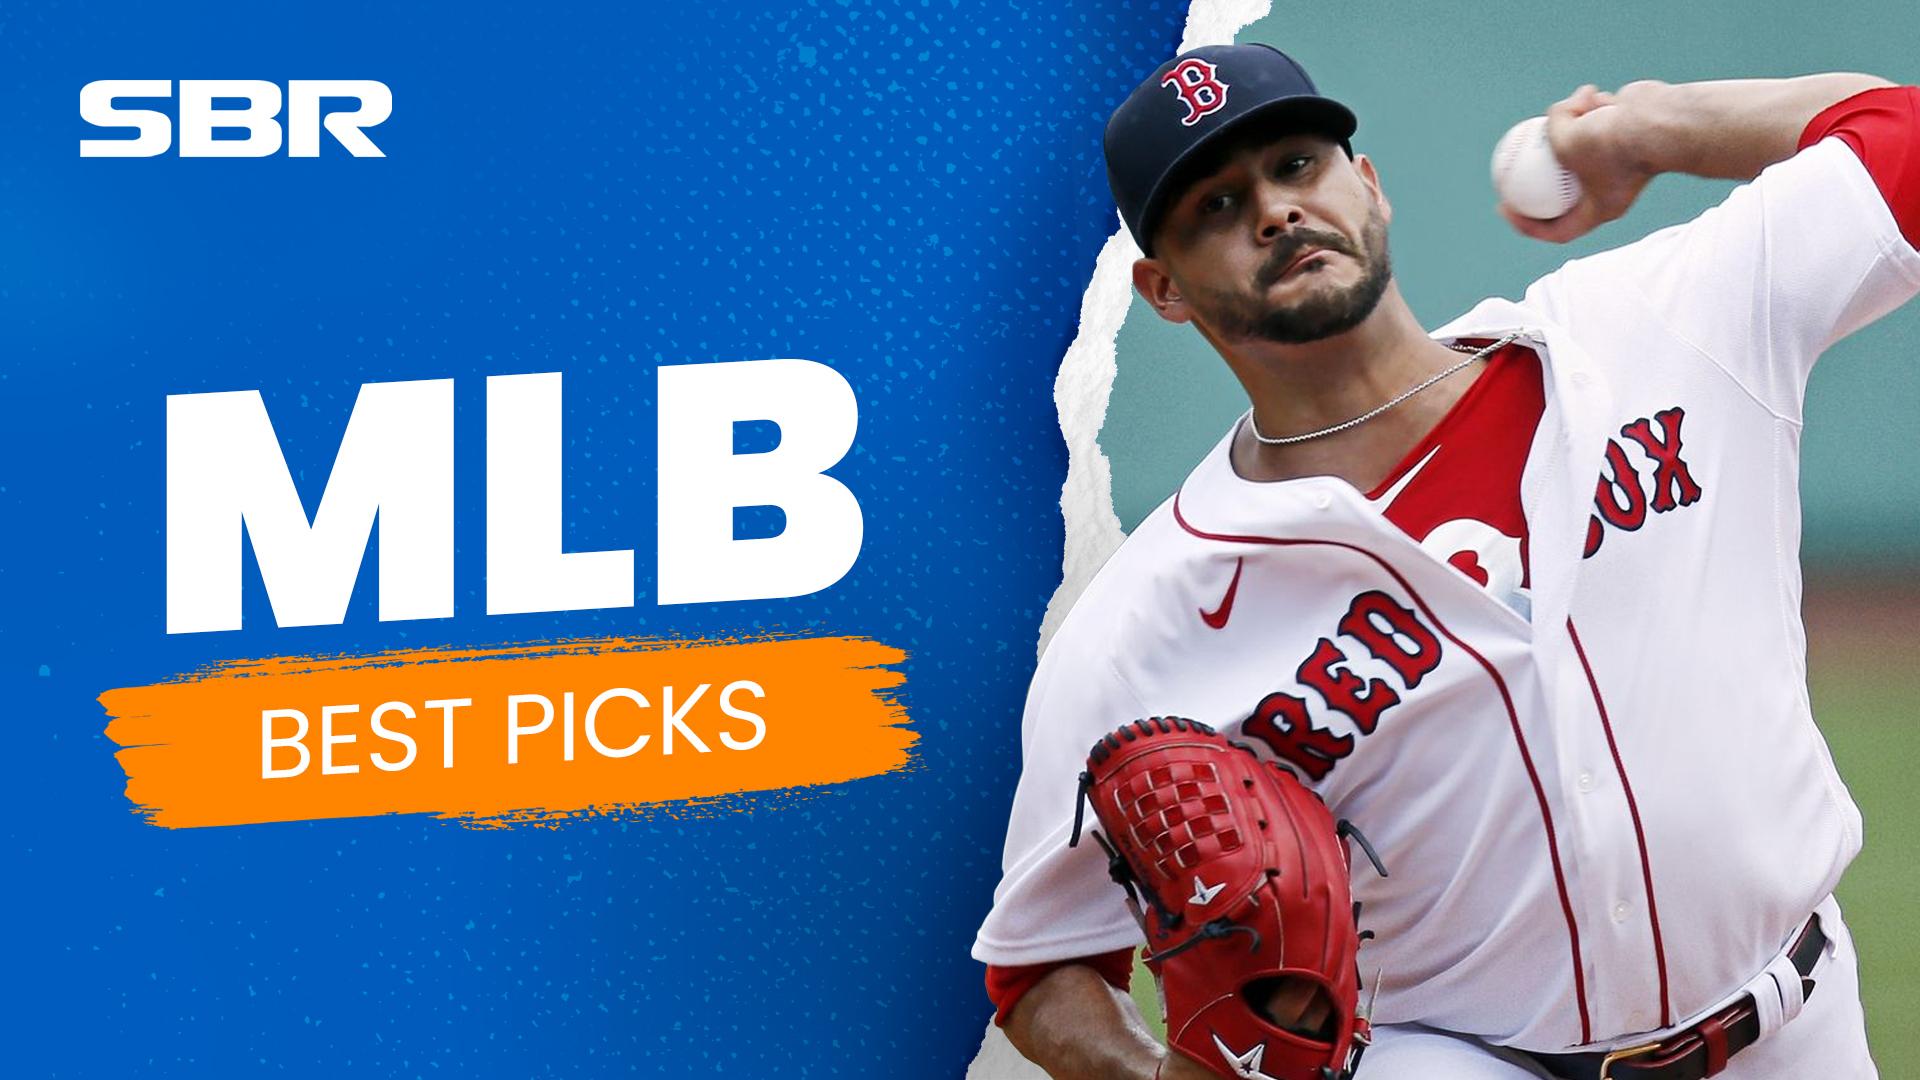 MLB Best Bets, Baseball Picks & Game Predictions (July 31st)